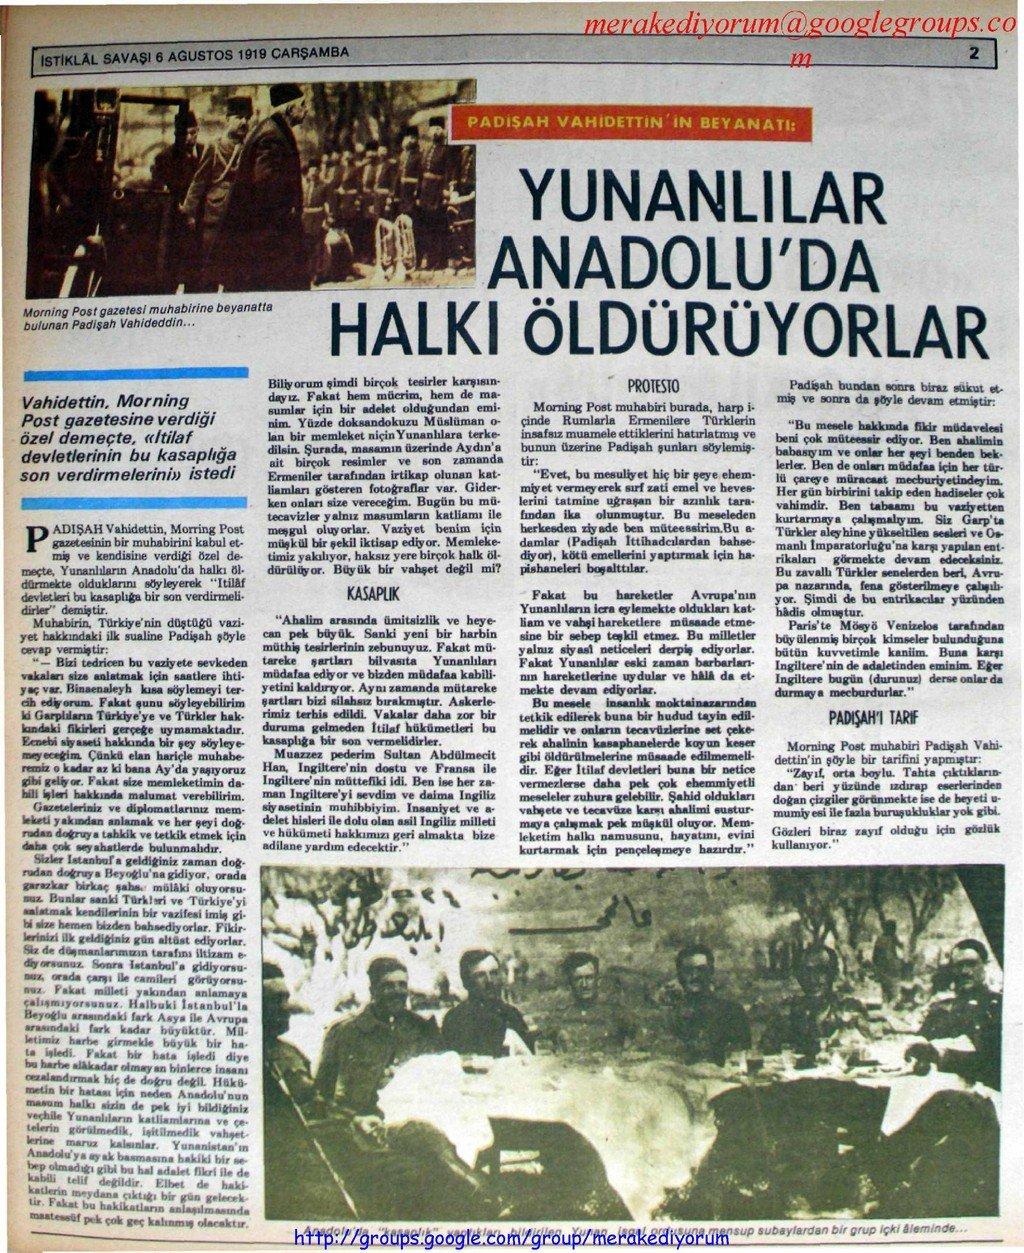 istiklal savaşı gazetesi - 6 haziran 1919